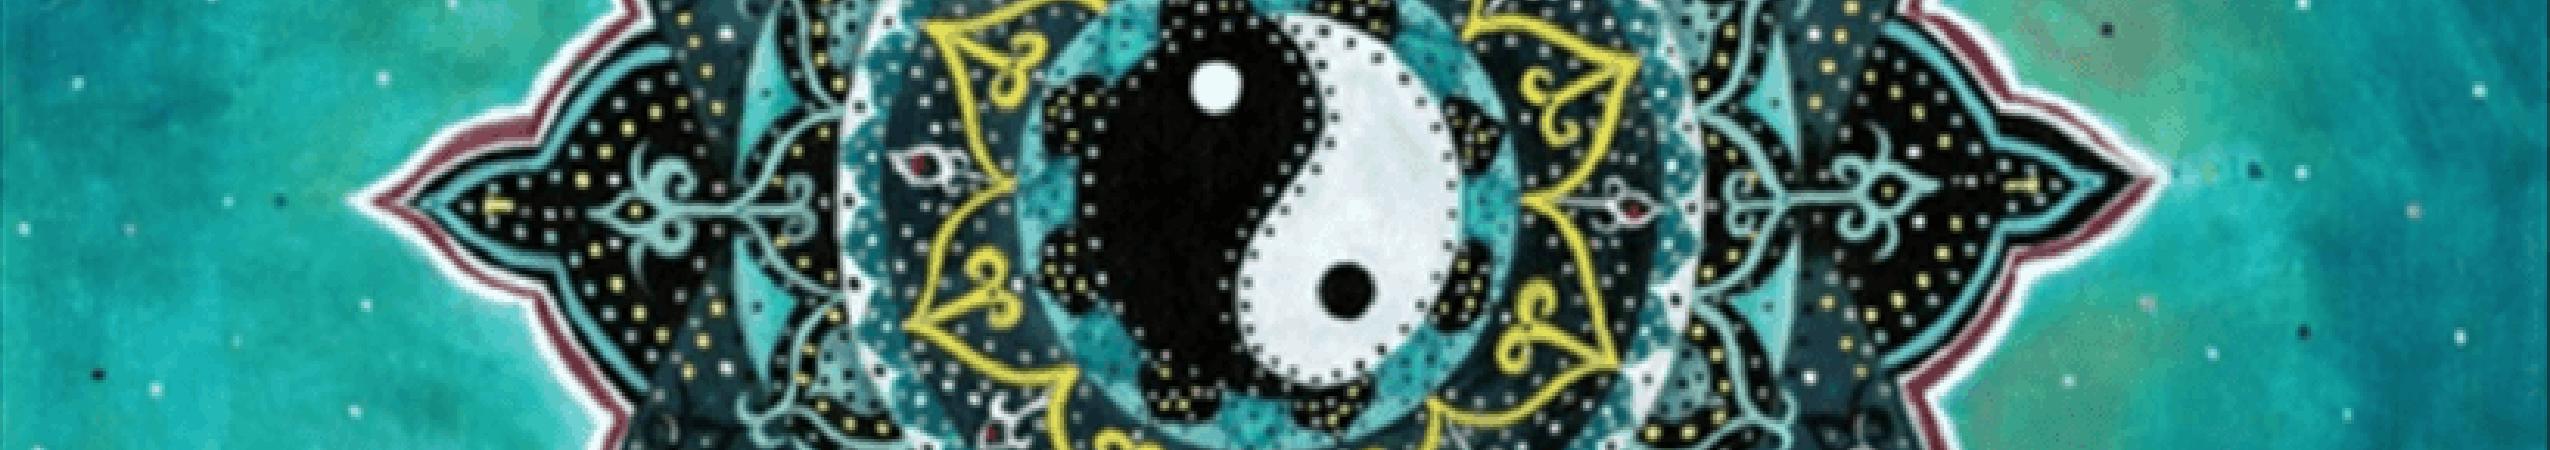 yin yang blog